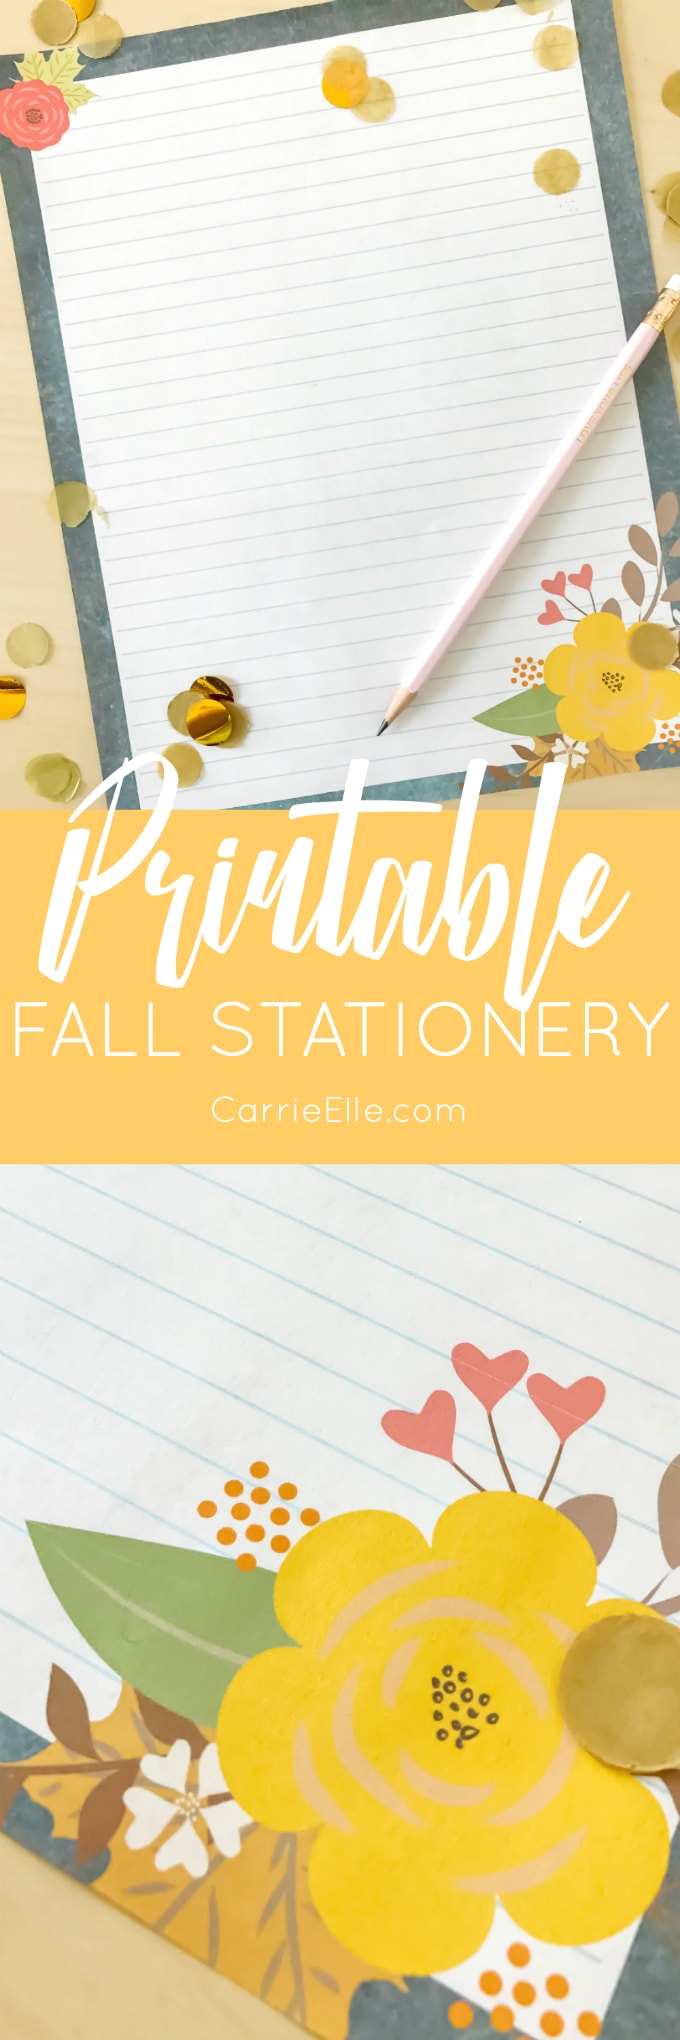 Printable Fall Stationery